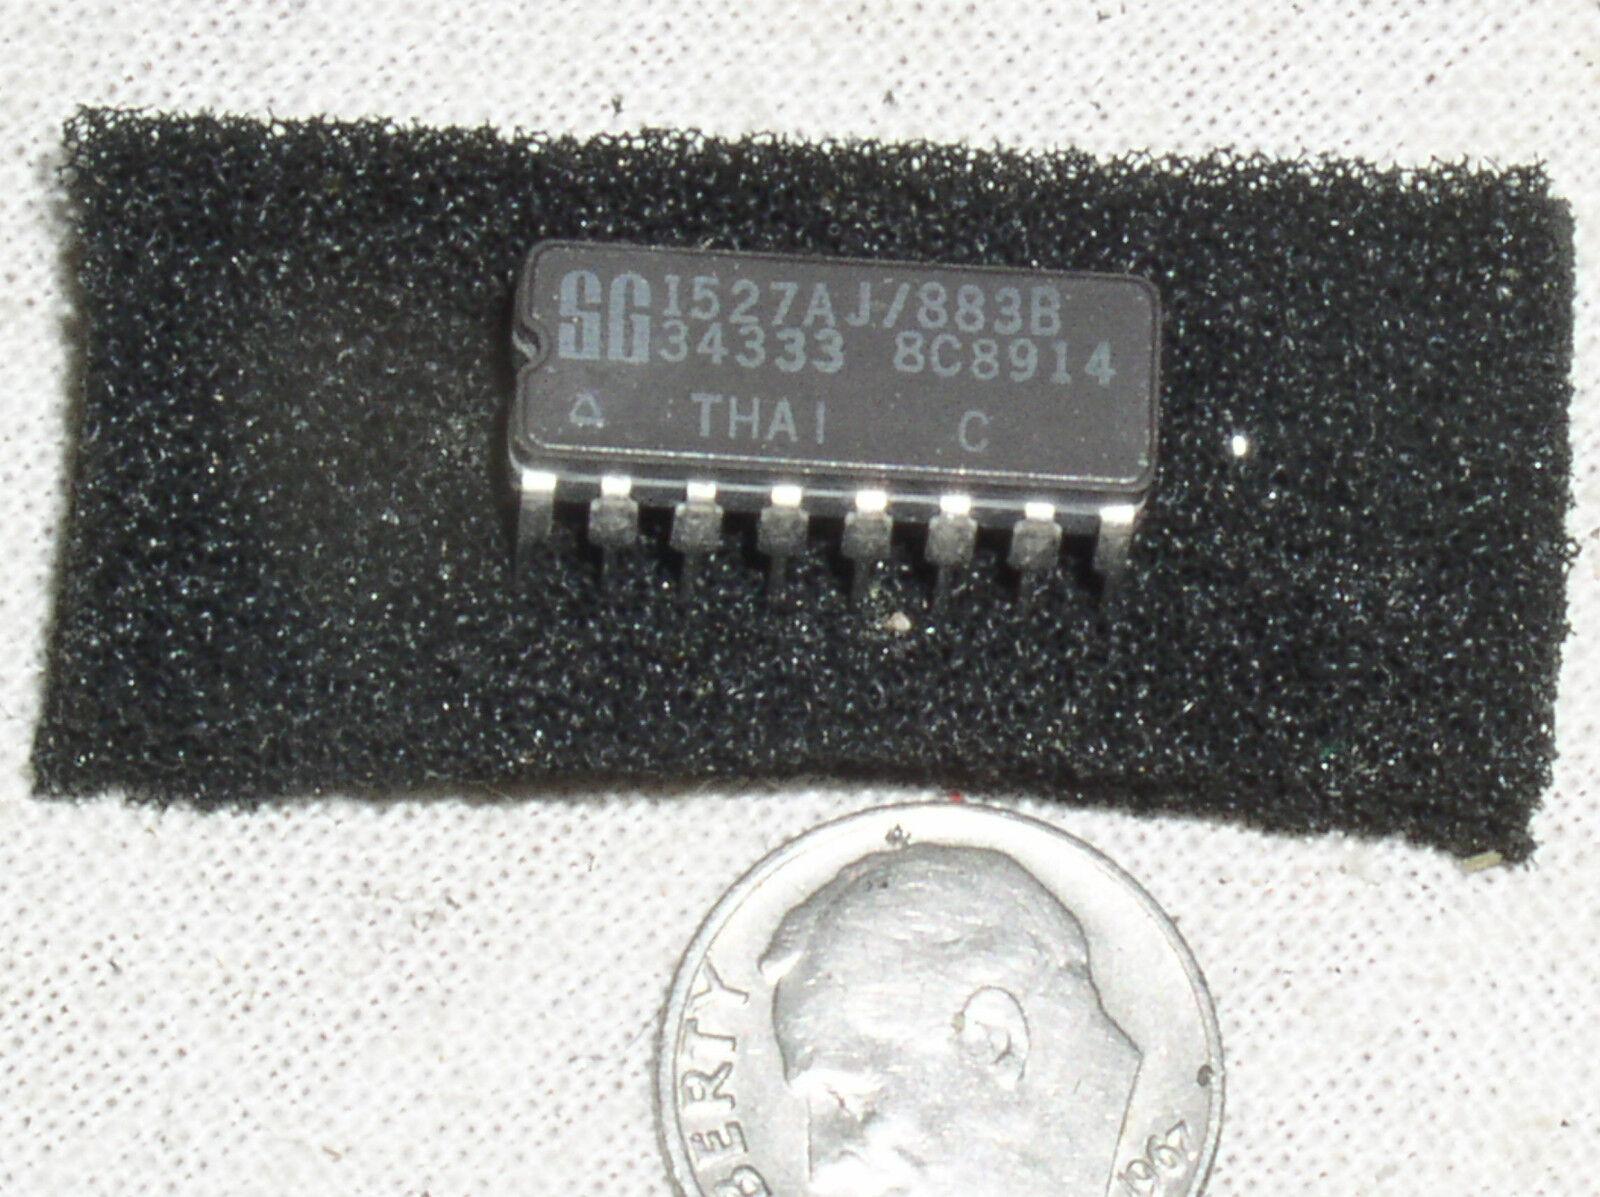 NOS SG 1527 1527AJ//883B MIL MILITARY VOLTAGE MODE PWM POWER SUPPLY REGULATOR IC